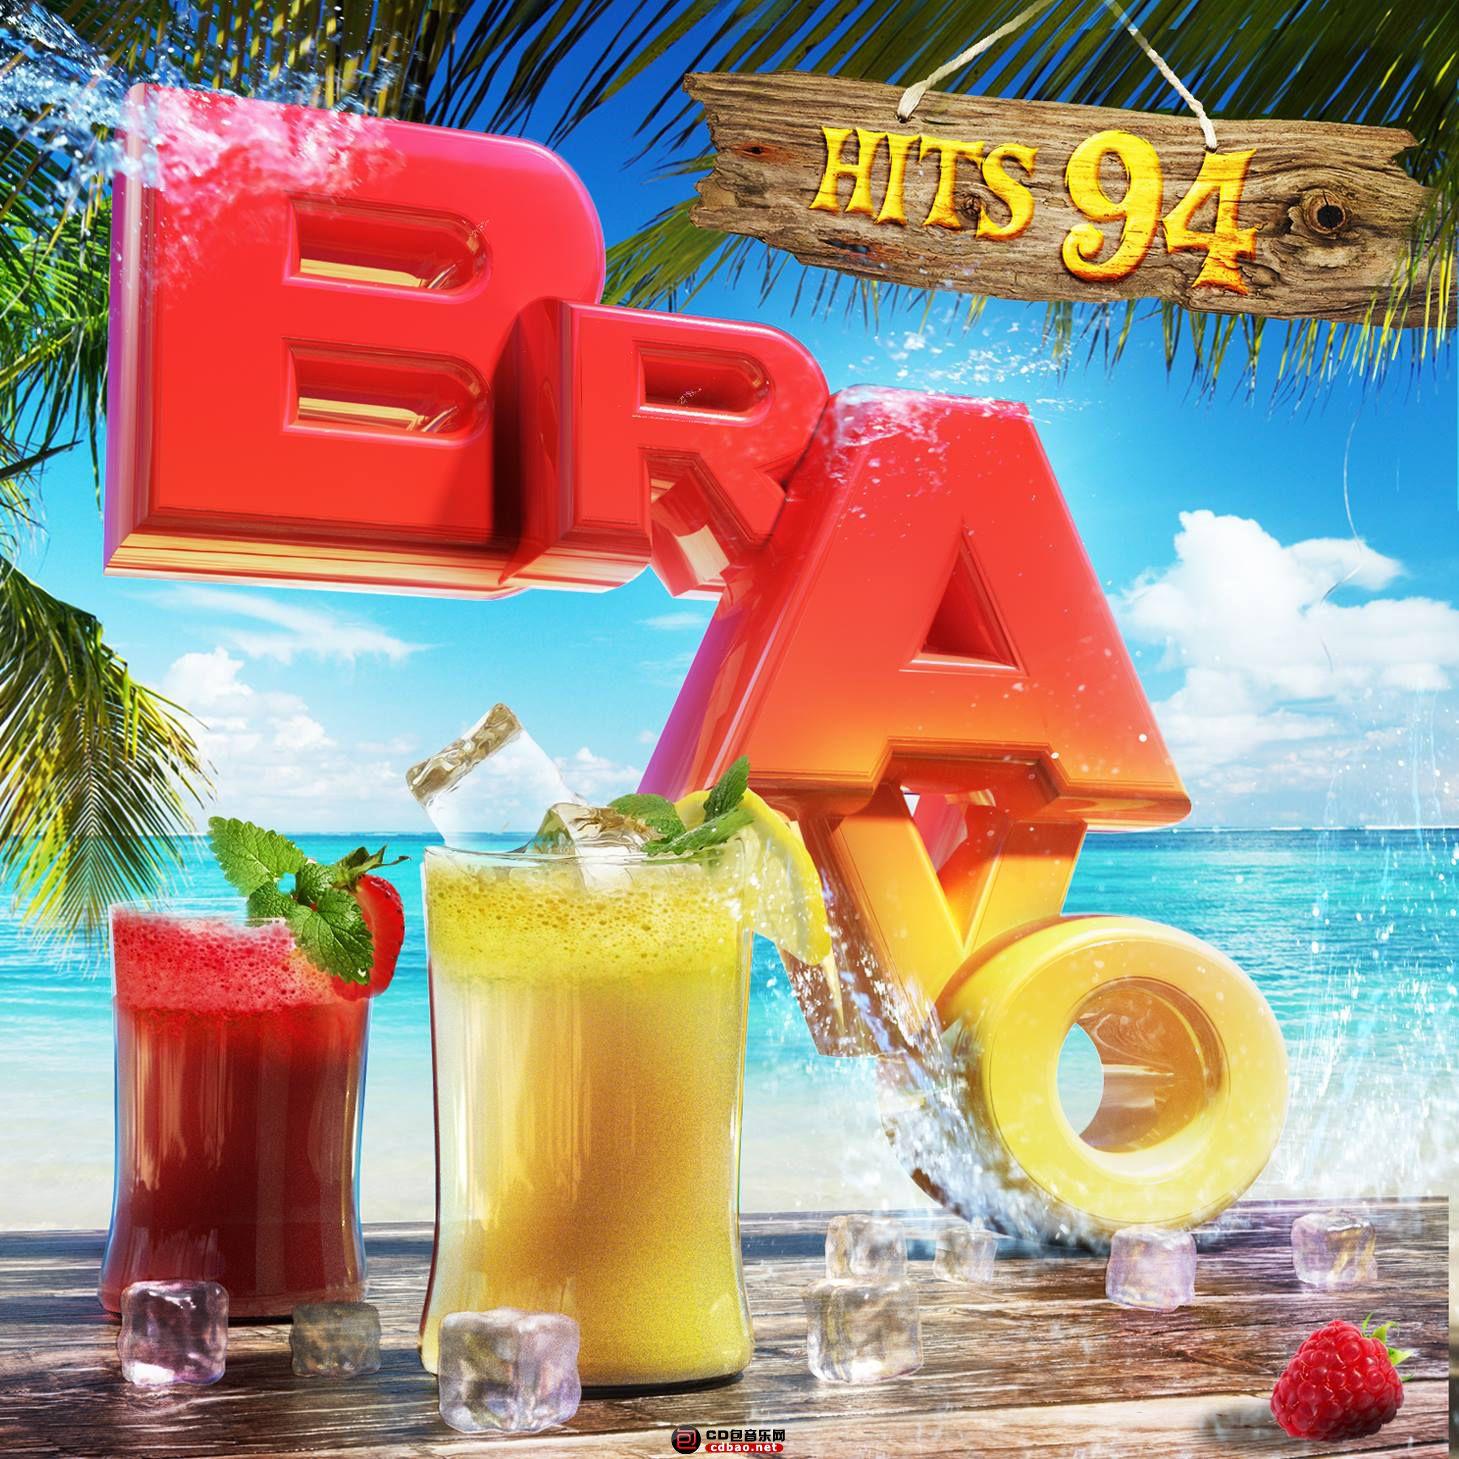 VA - BRAVO Hits 94 (2016)_dd-front-clear.jpg